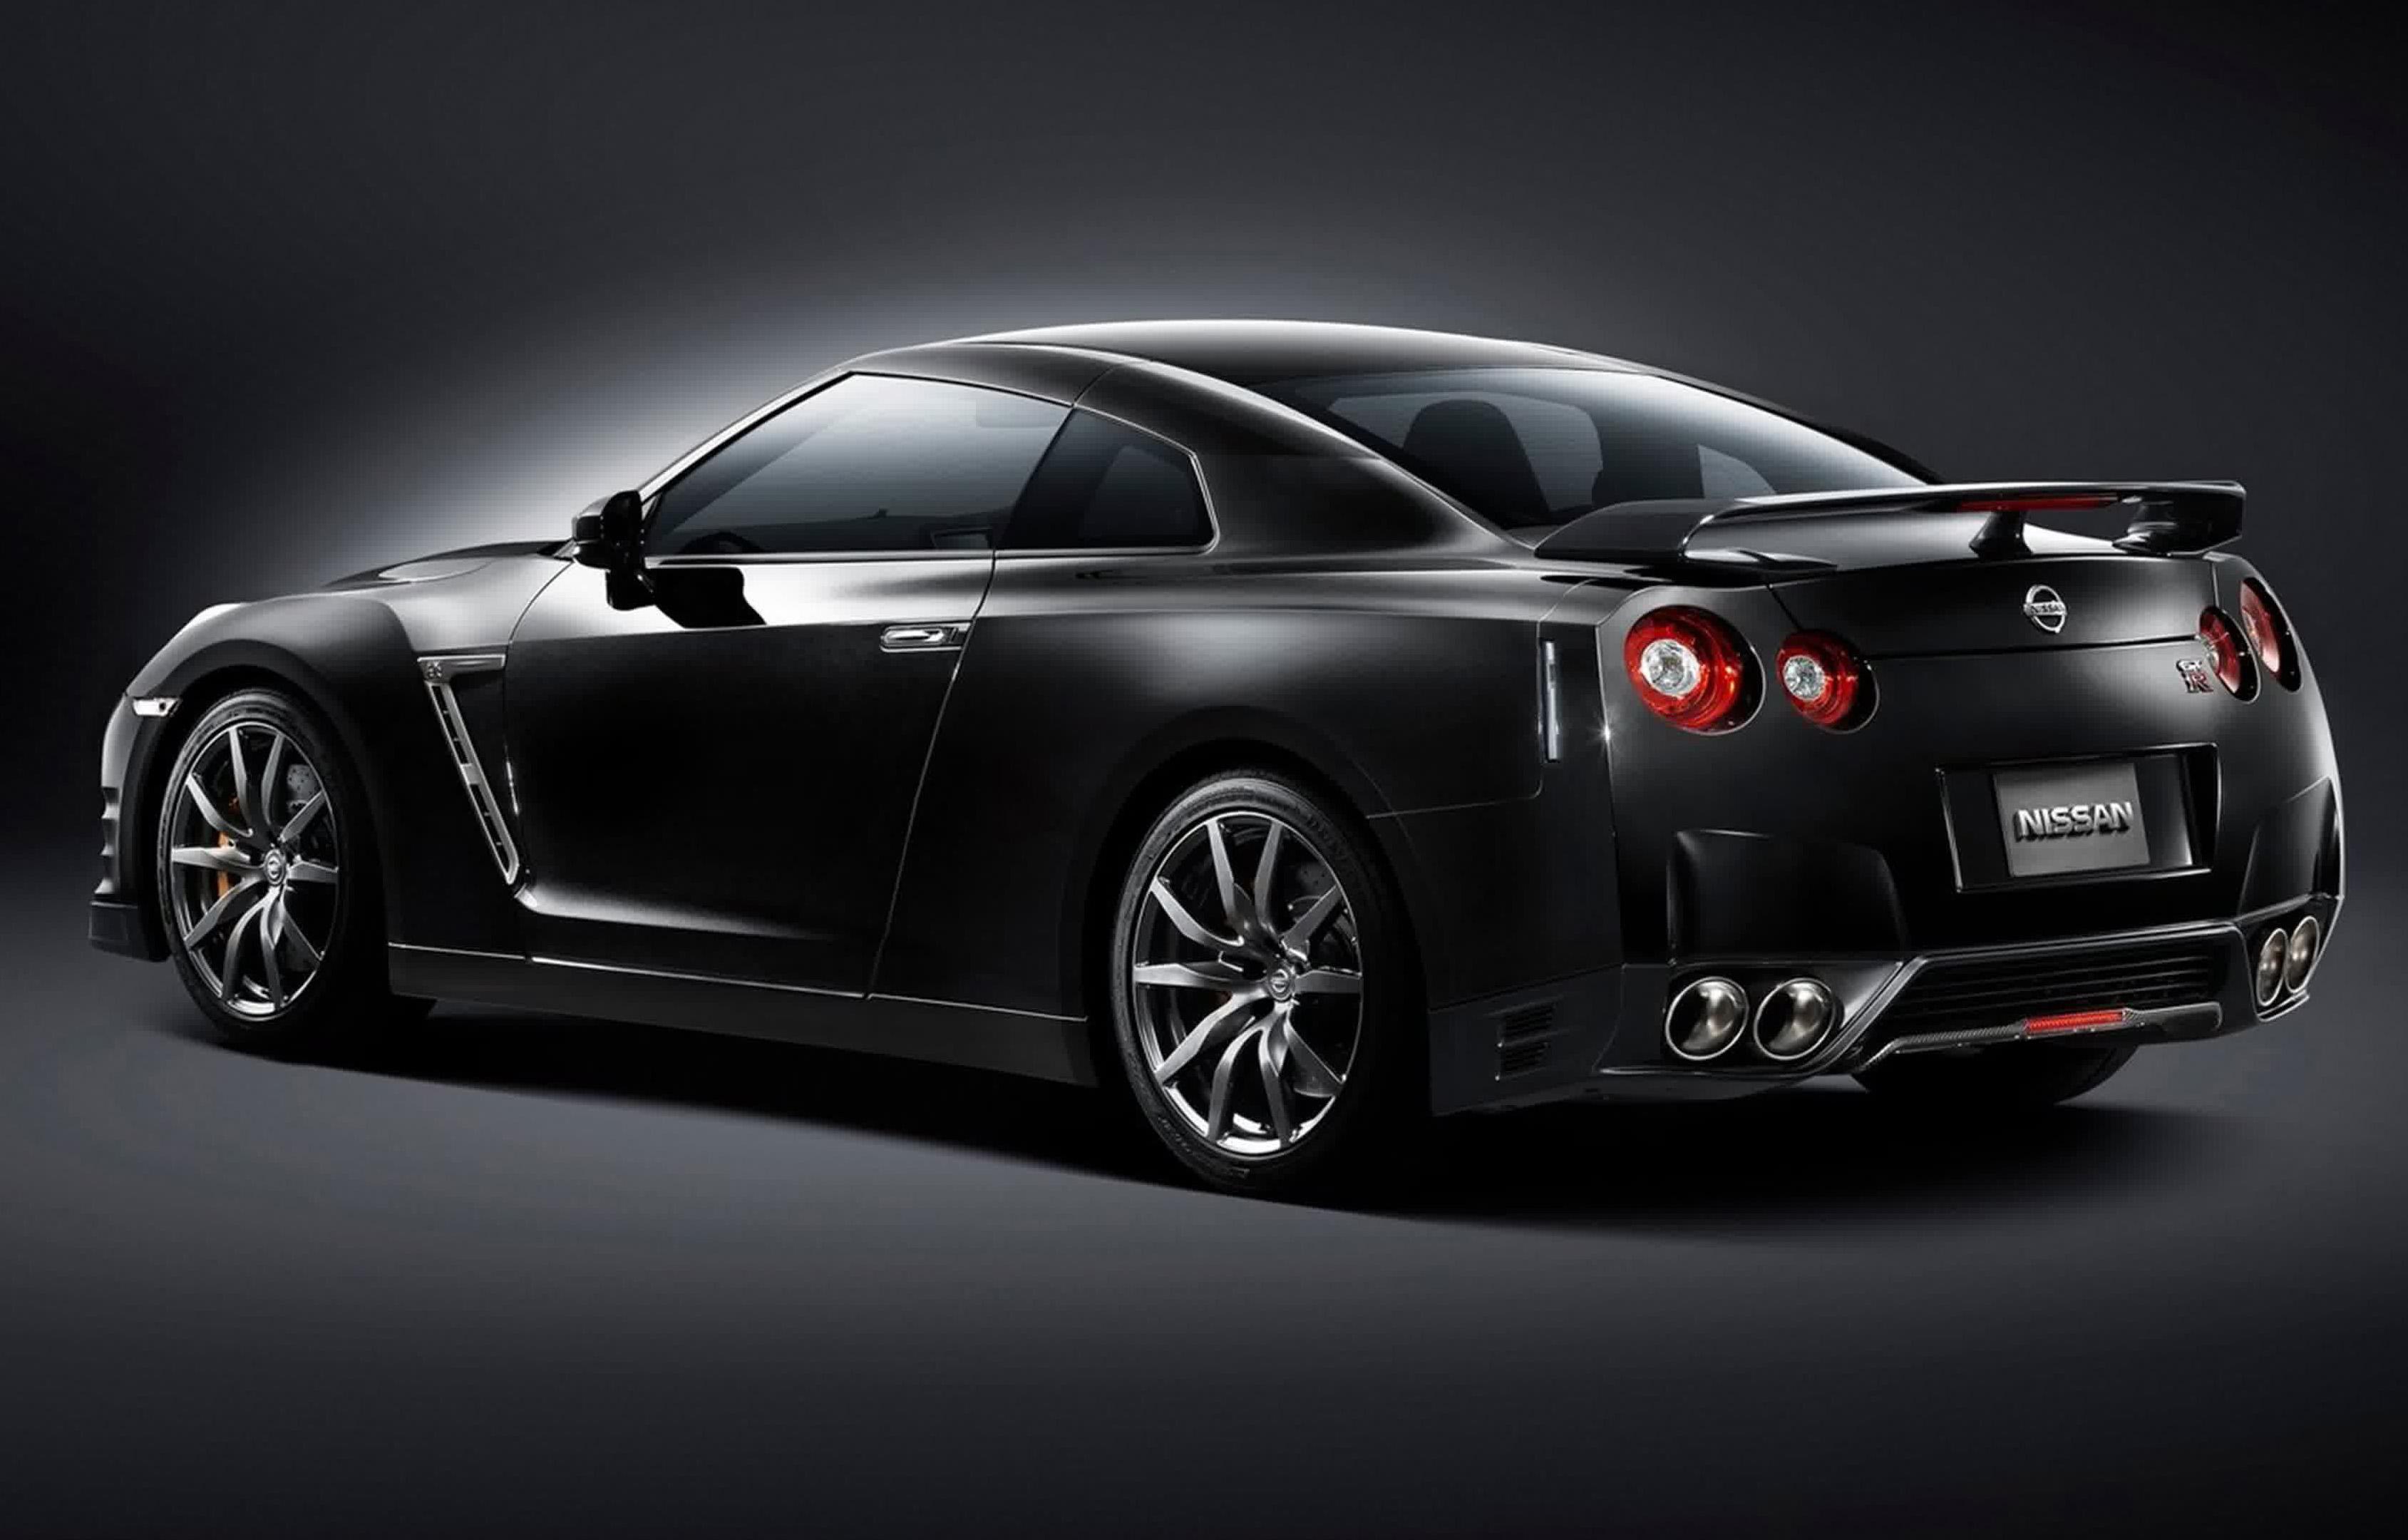 2016 Nissan Gt R Black Edition Image 481 3378x2160